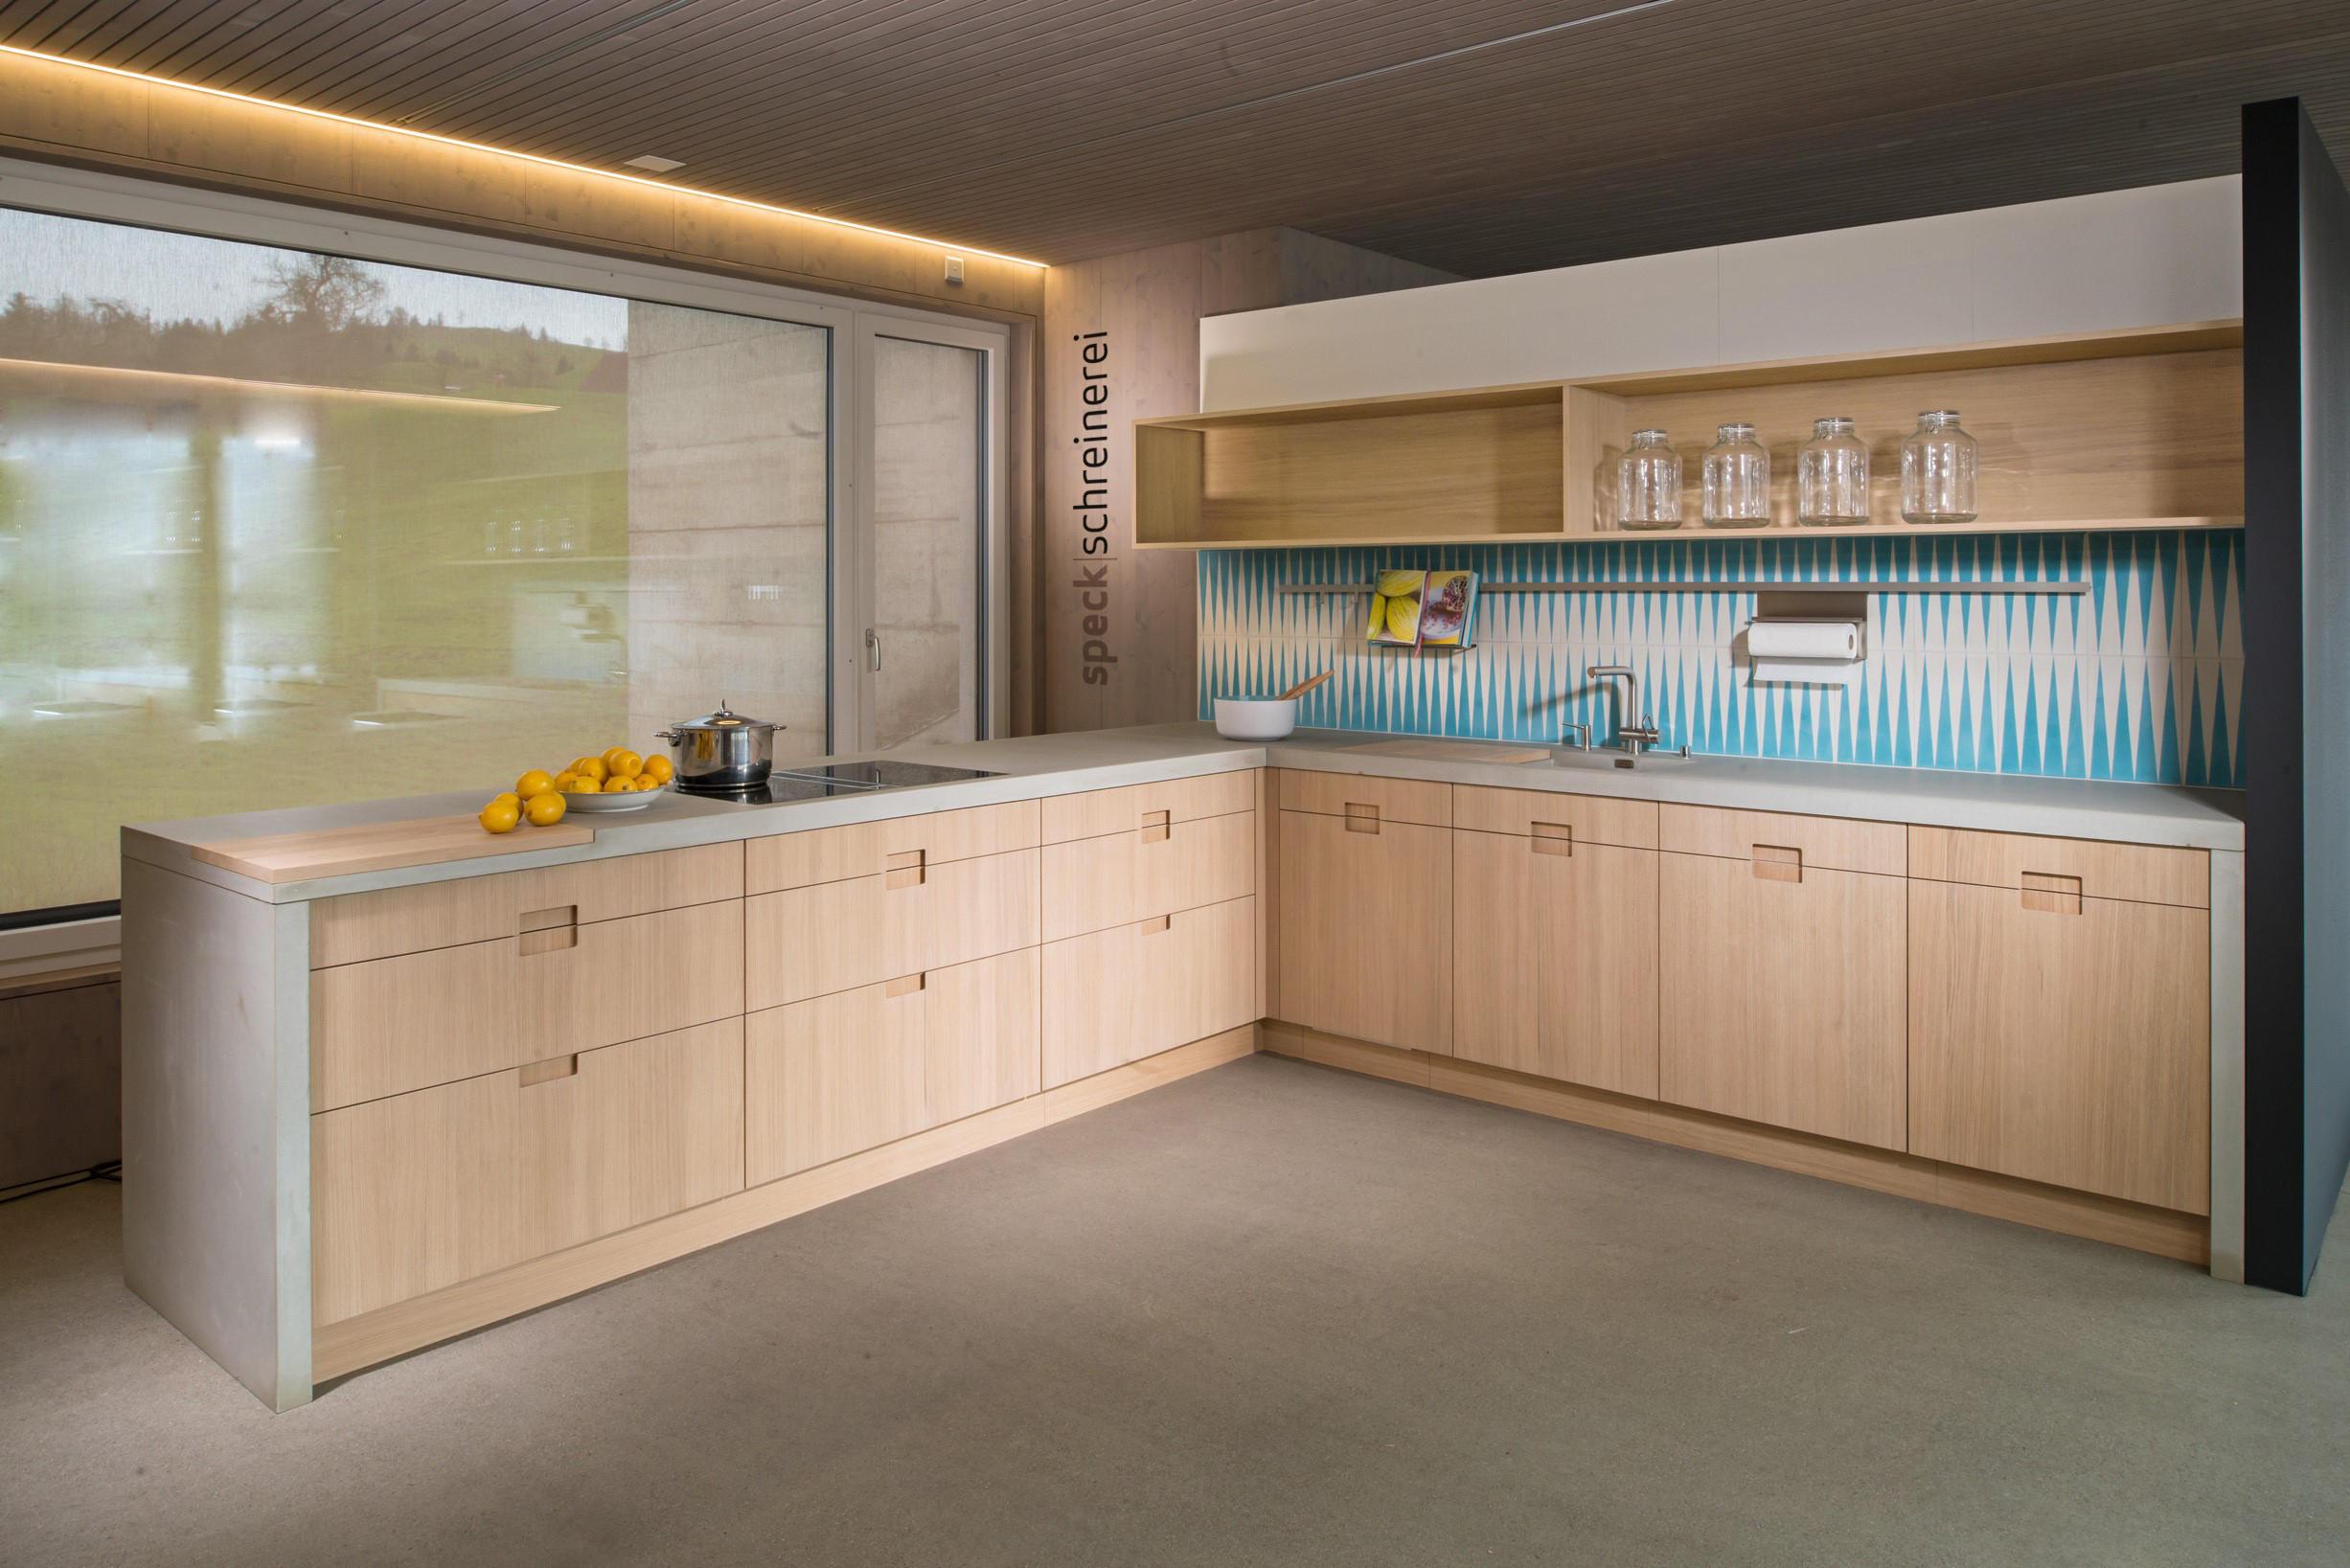 Concrete kitchen design example countertops from dade for Kitchen design examples